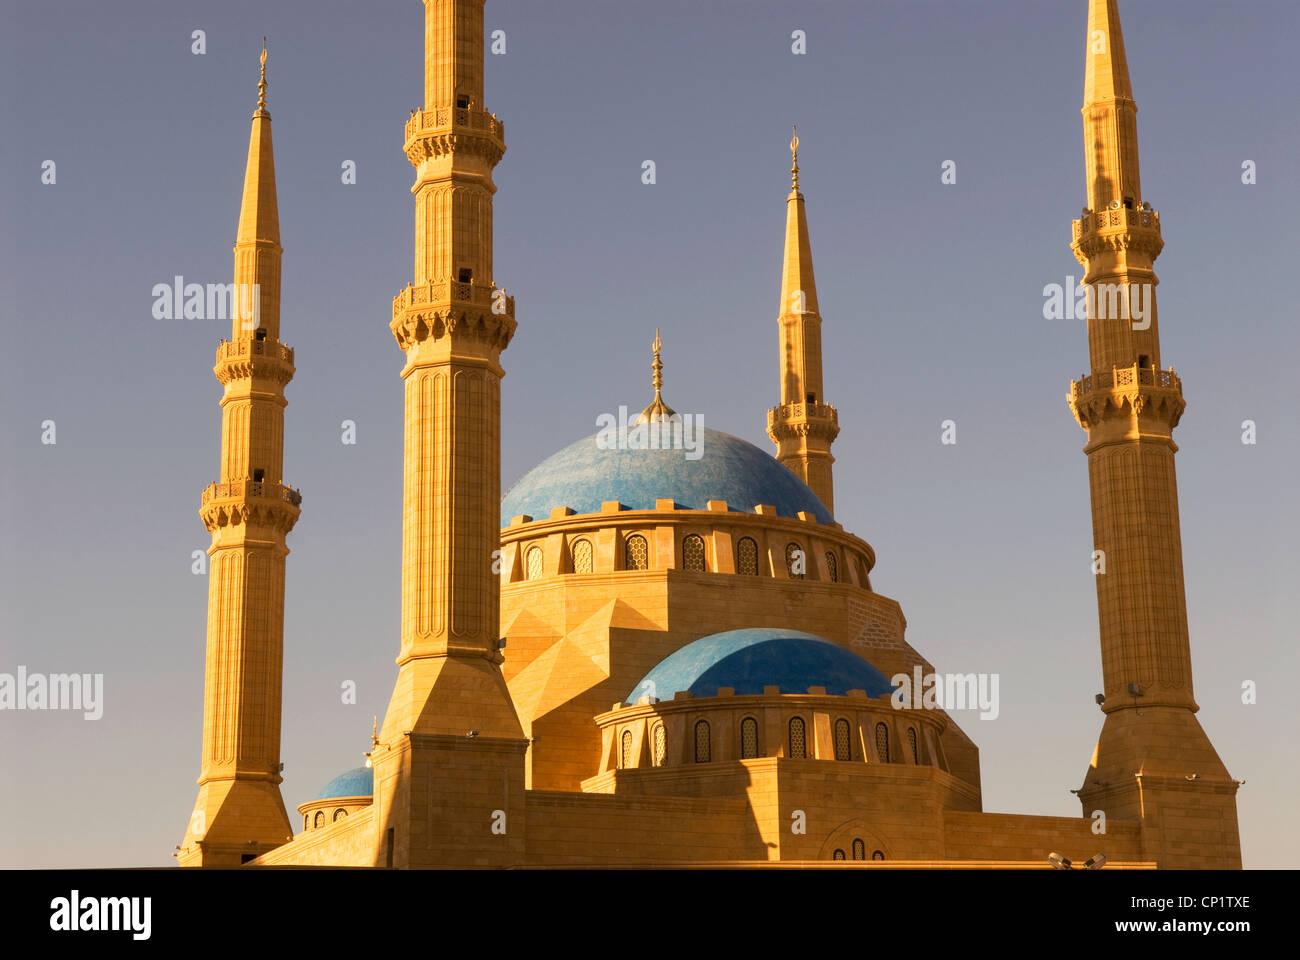 Muhammad Al-Amine mosque, Downtown, Beirut, Lebanon. Stock Photo